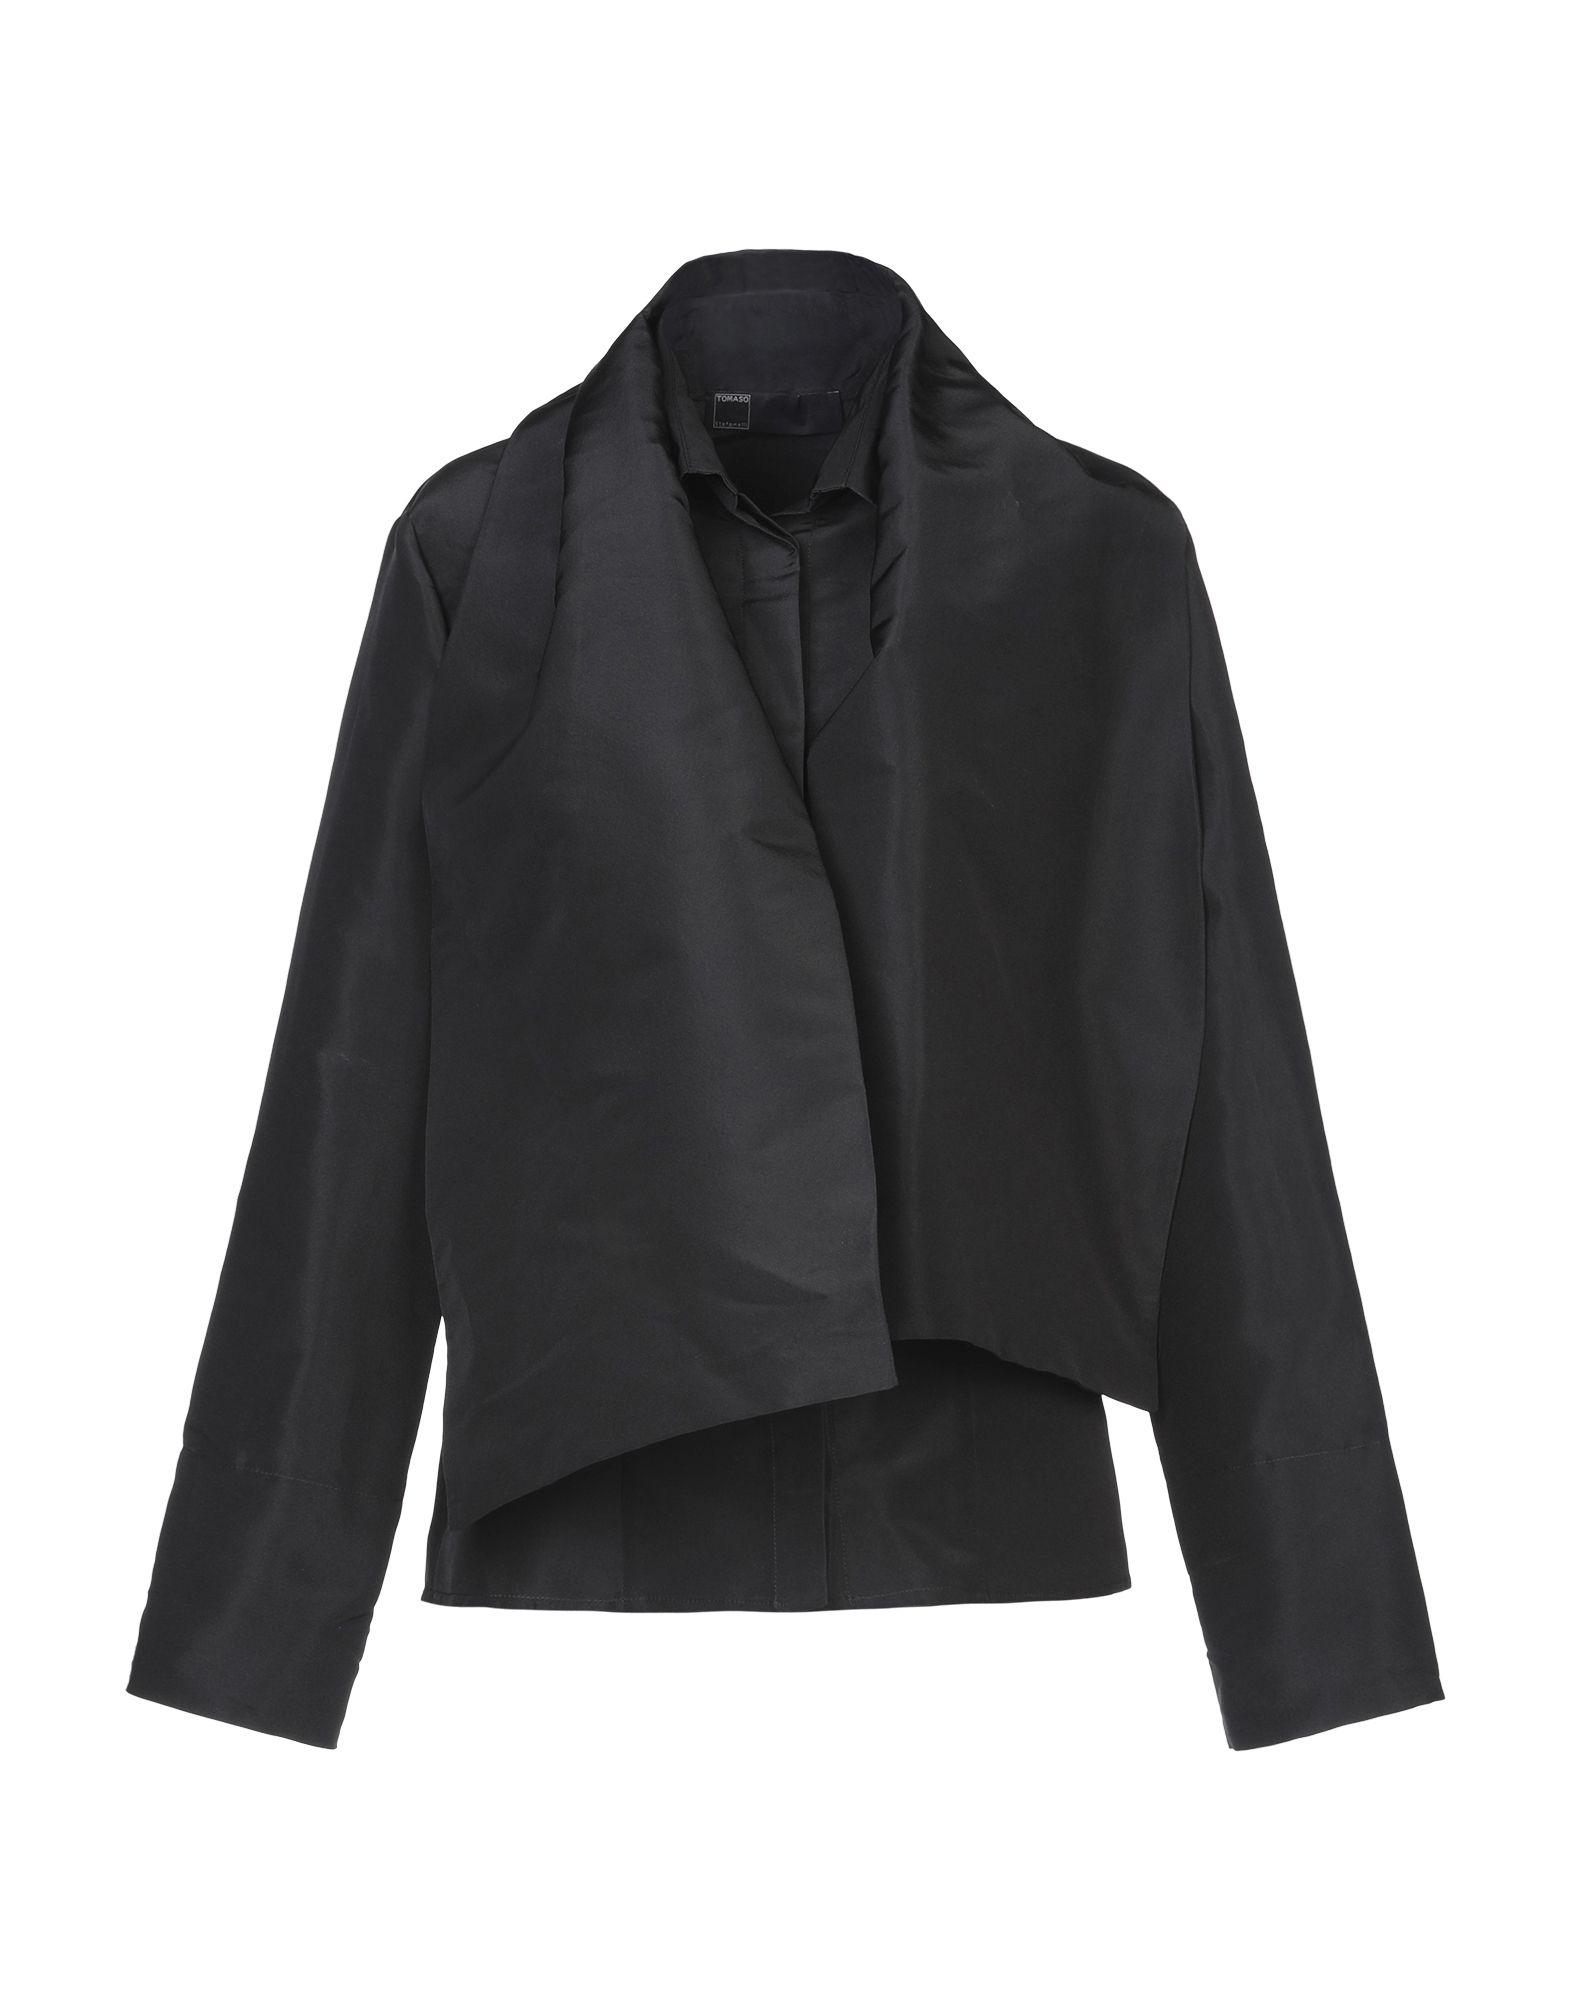 TOMASO STEFANELLI Pубашка tomaso stefanelli пальто